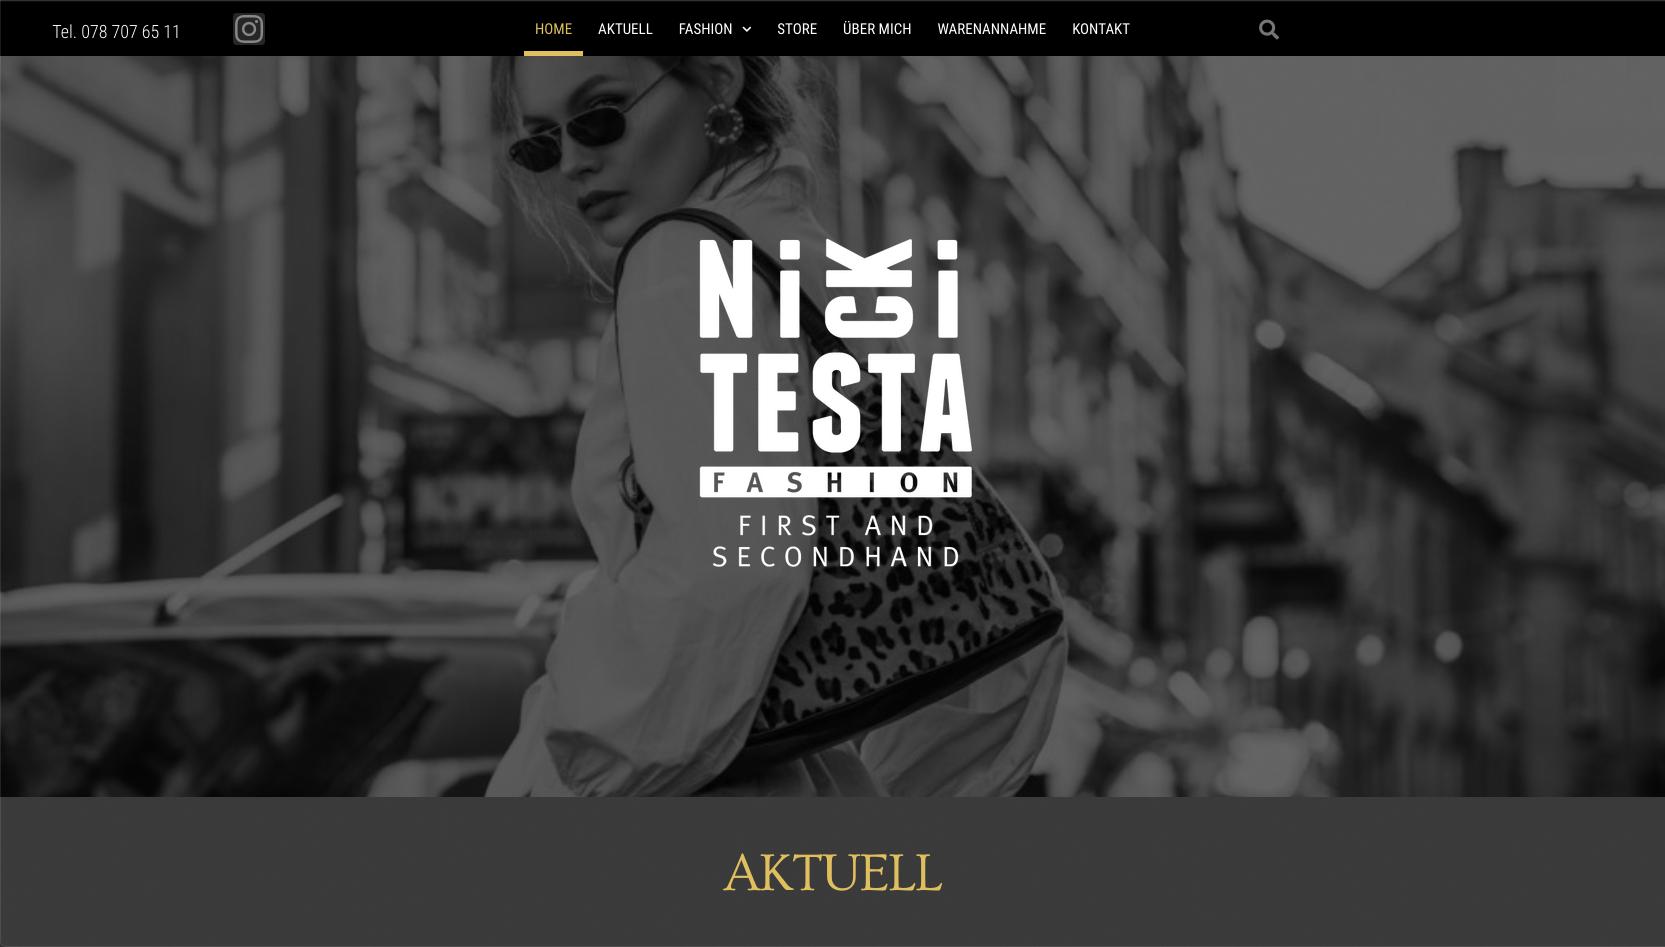 nicki-testa-home